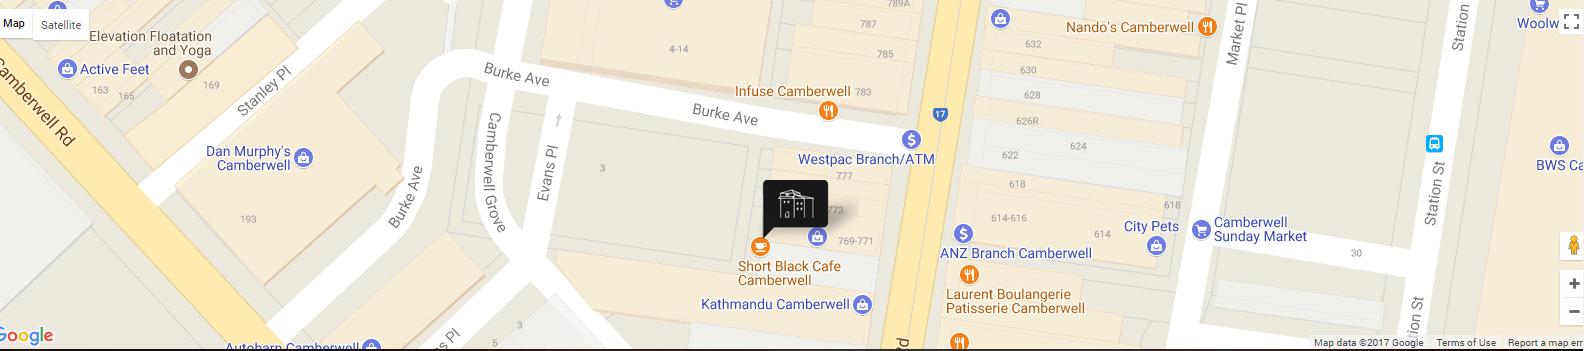 shortblack-map